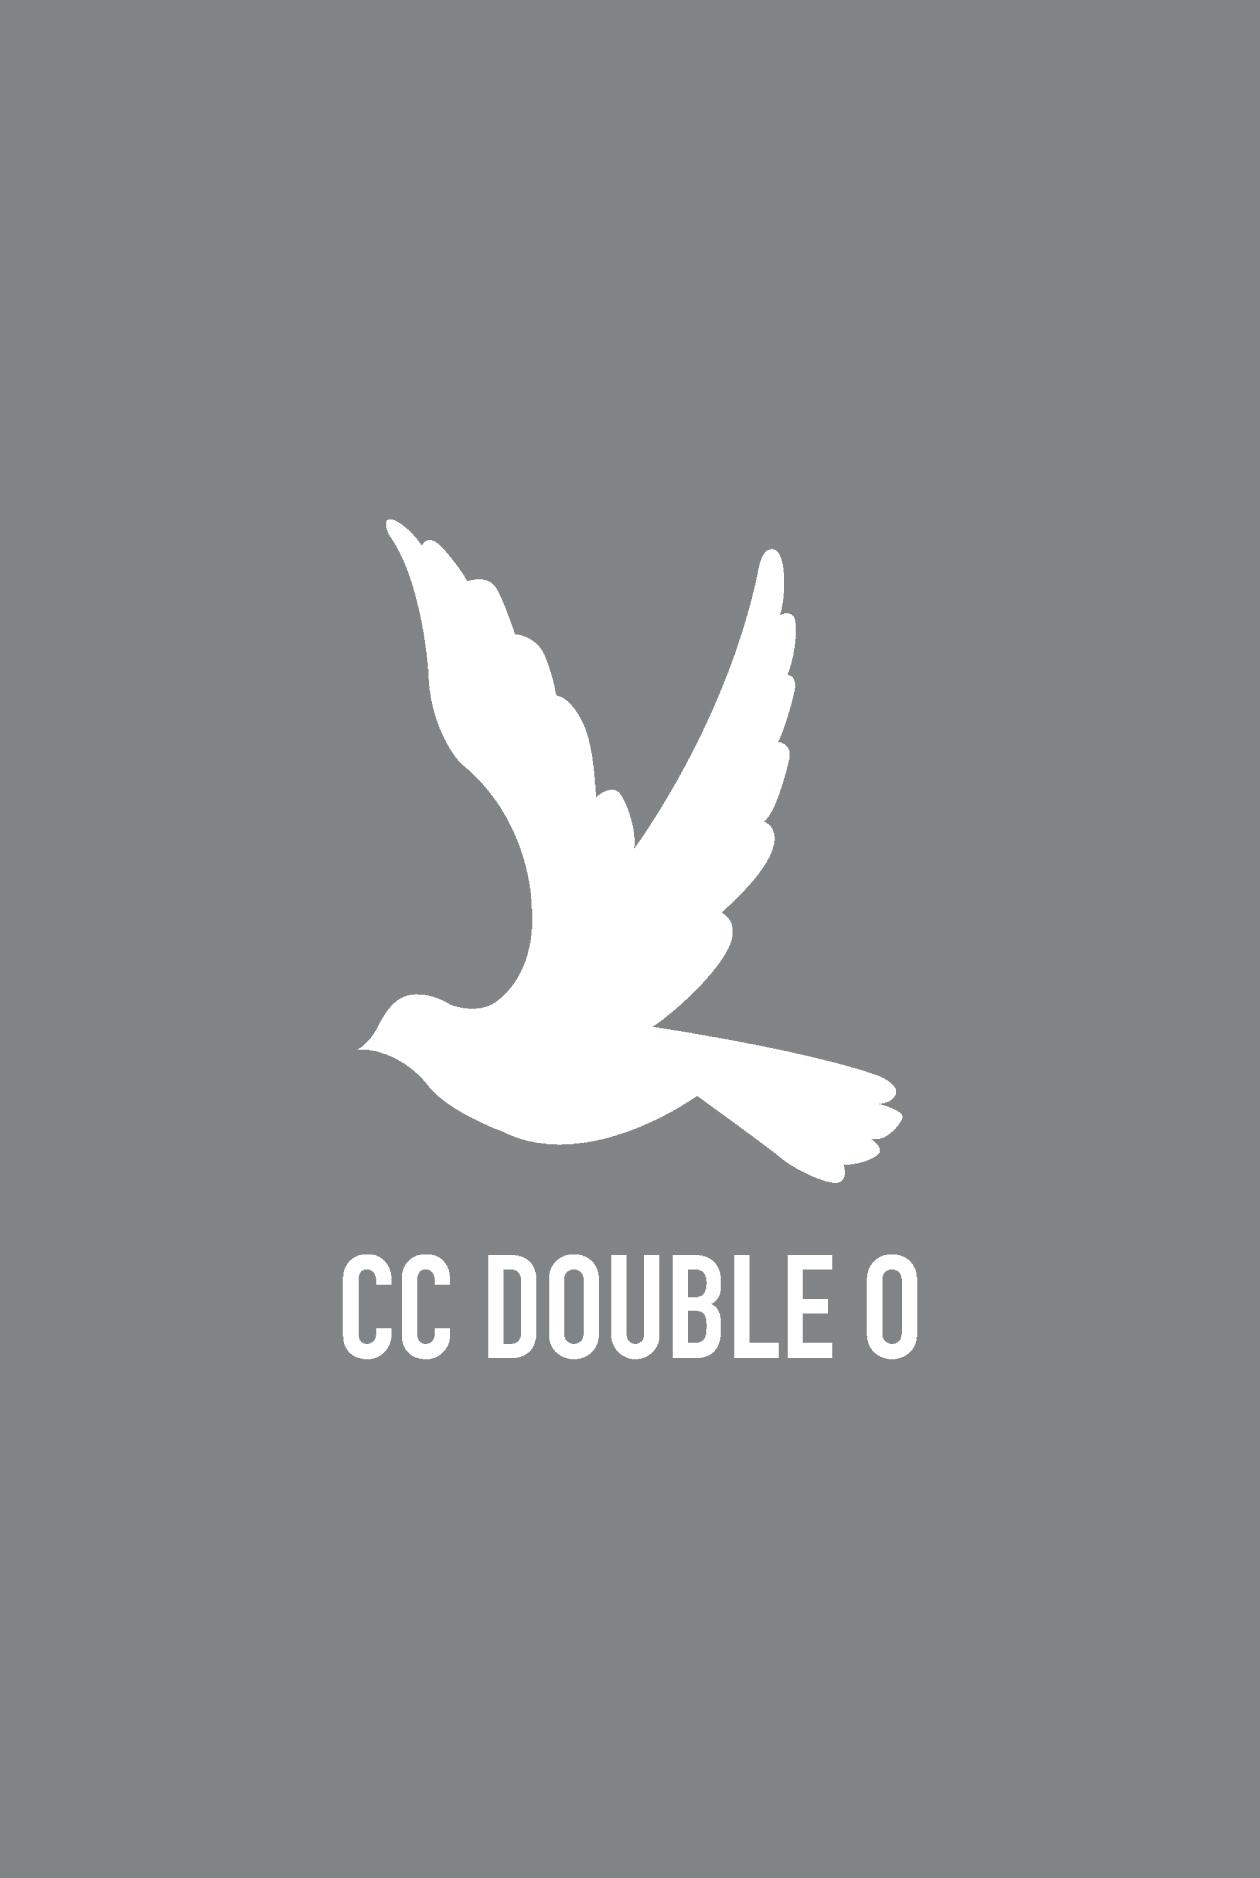 CC DOUBLE O Nylon Bag with Crossbody Strap